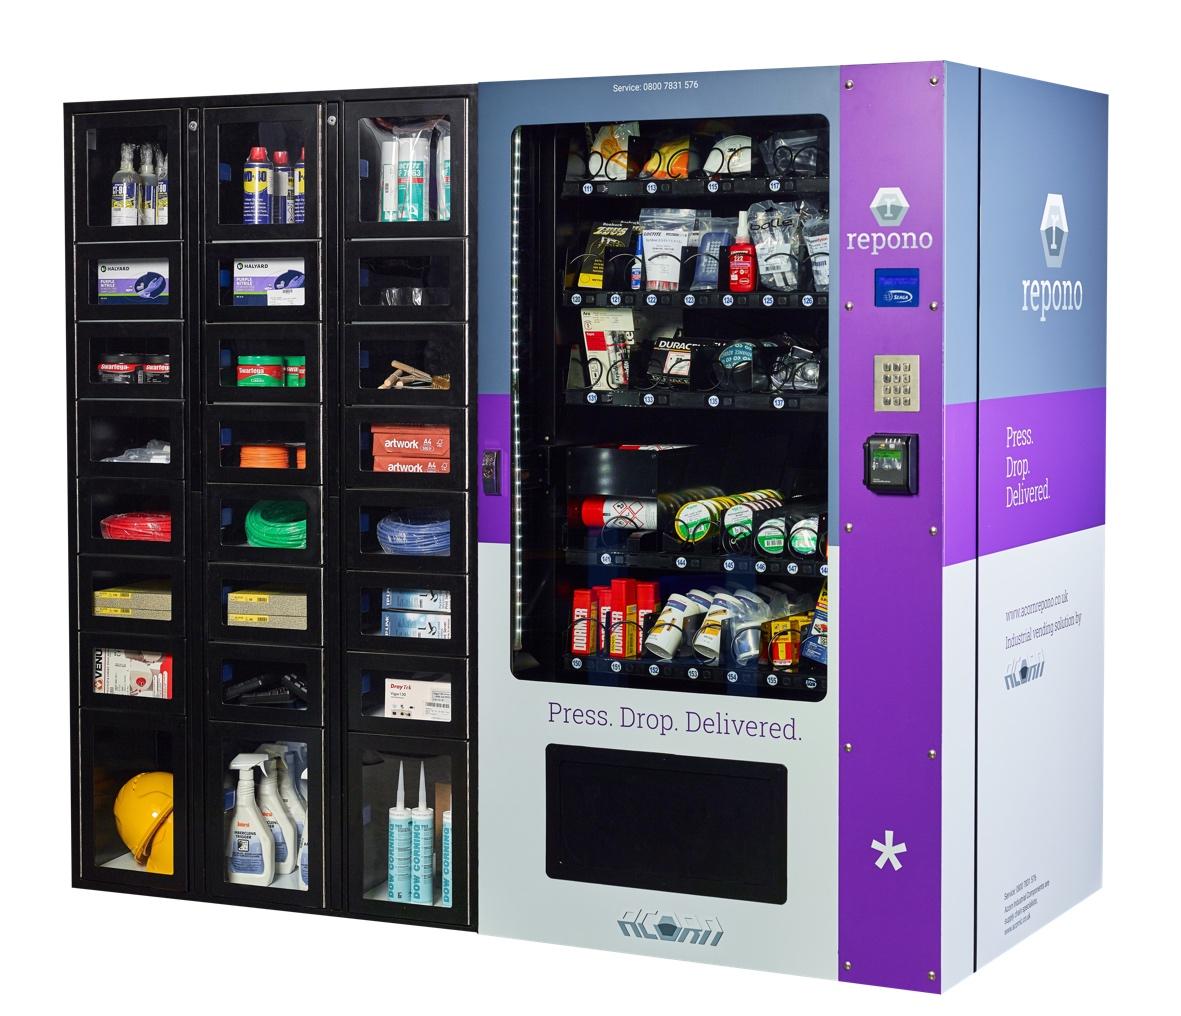 Acorn Repono full locker solution